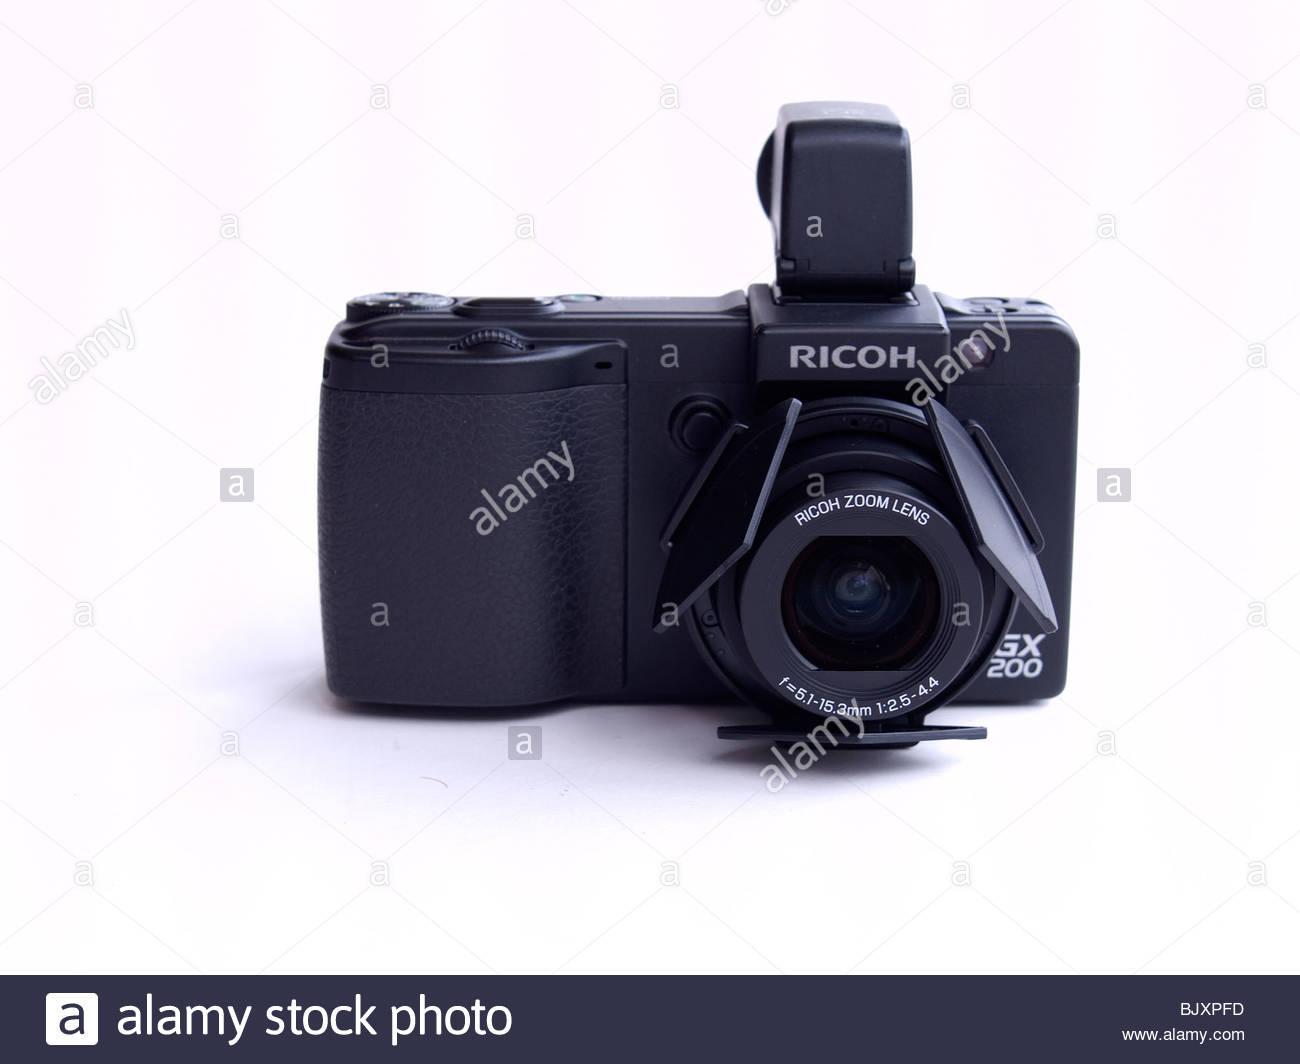 Ricoh Caplio GX200 professional quality compact digital camera on 1300x1064